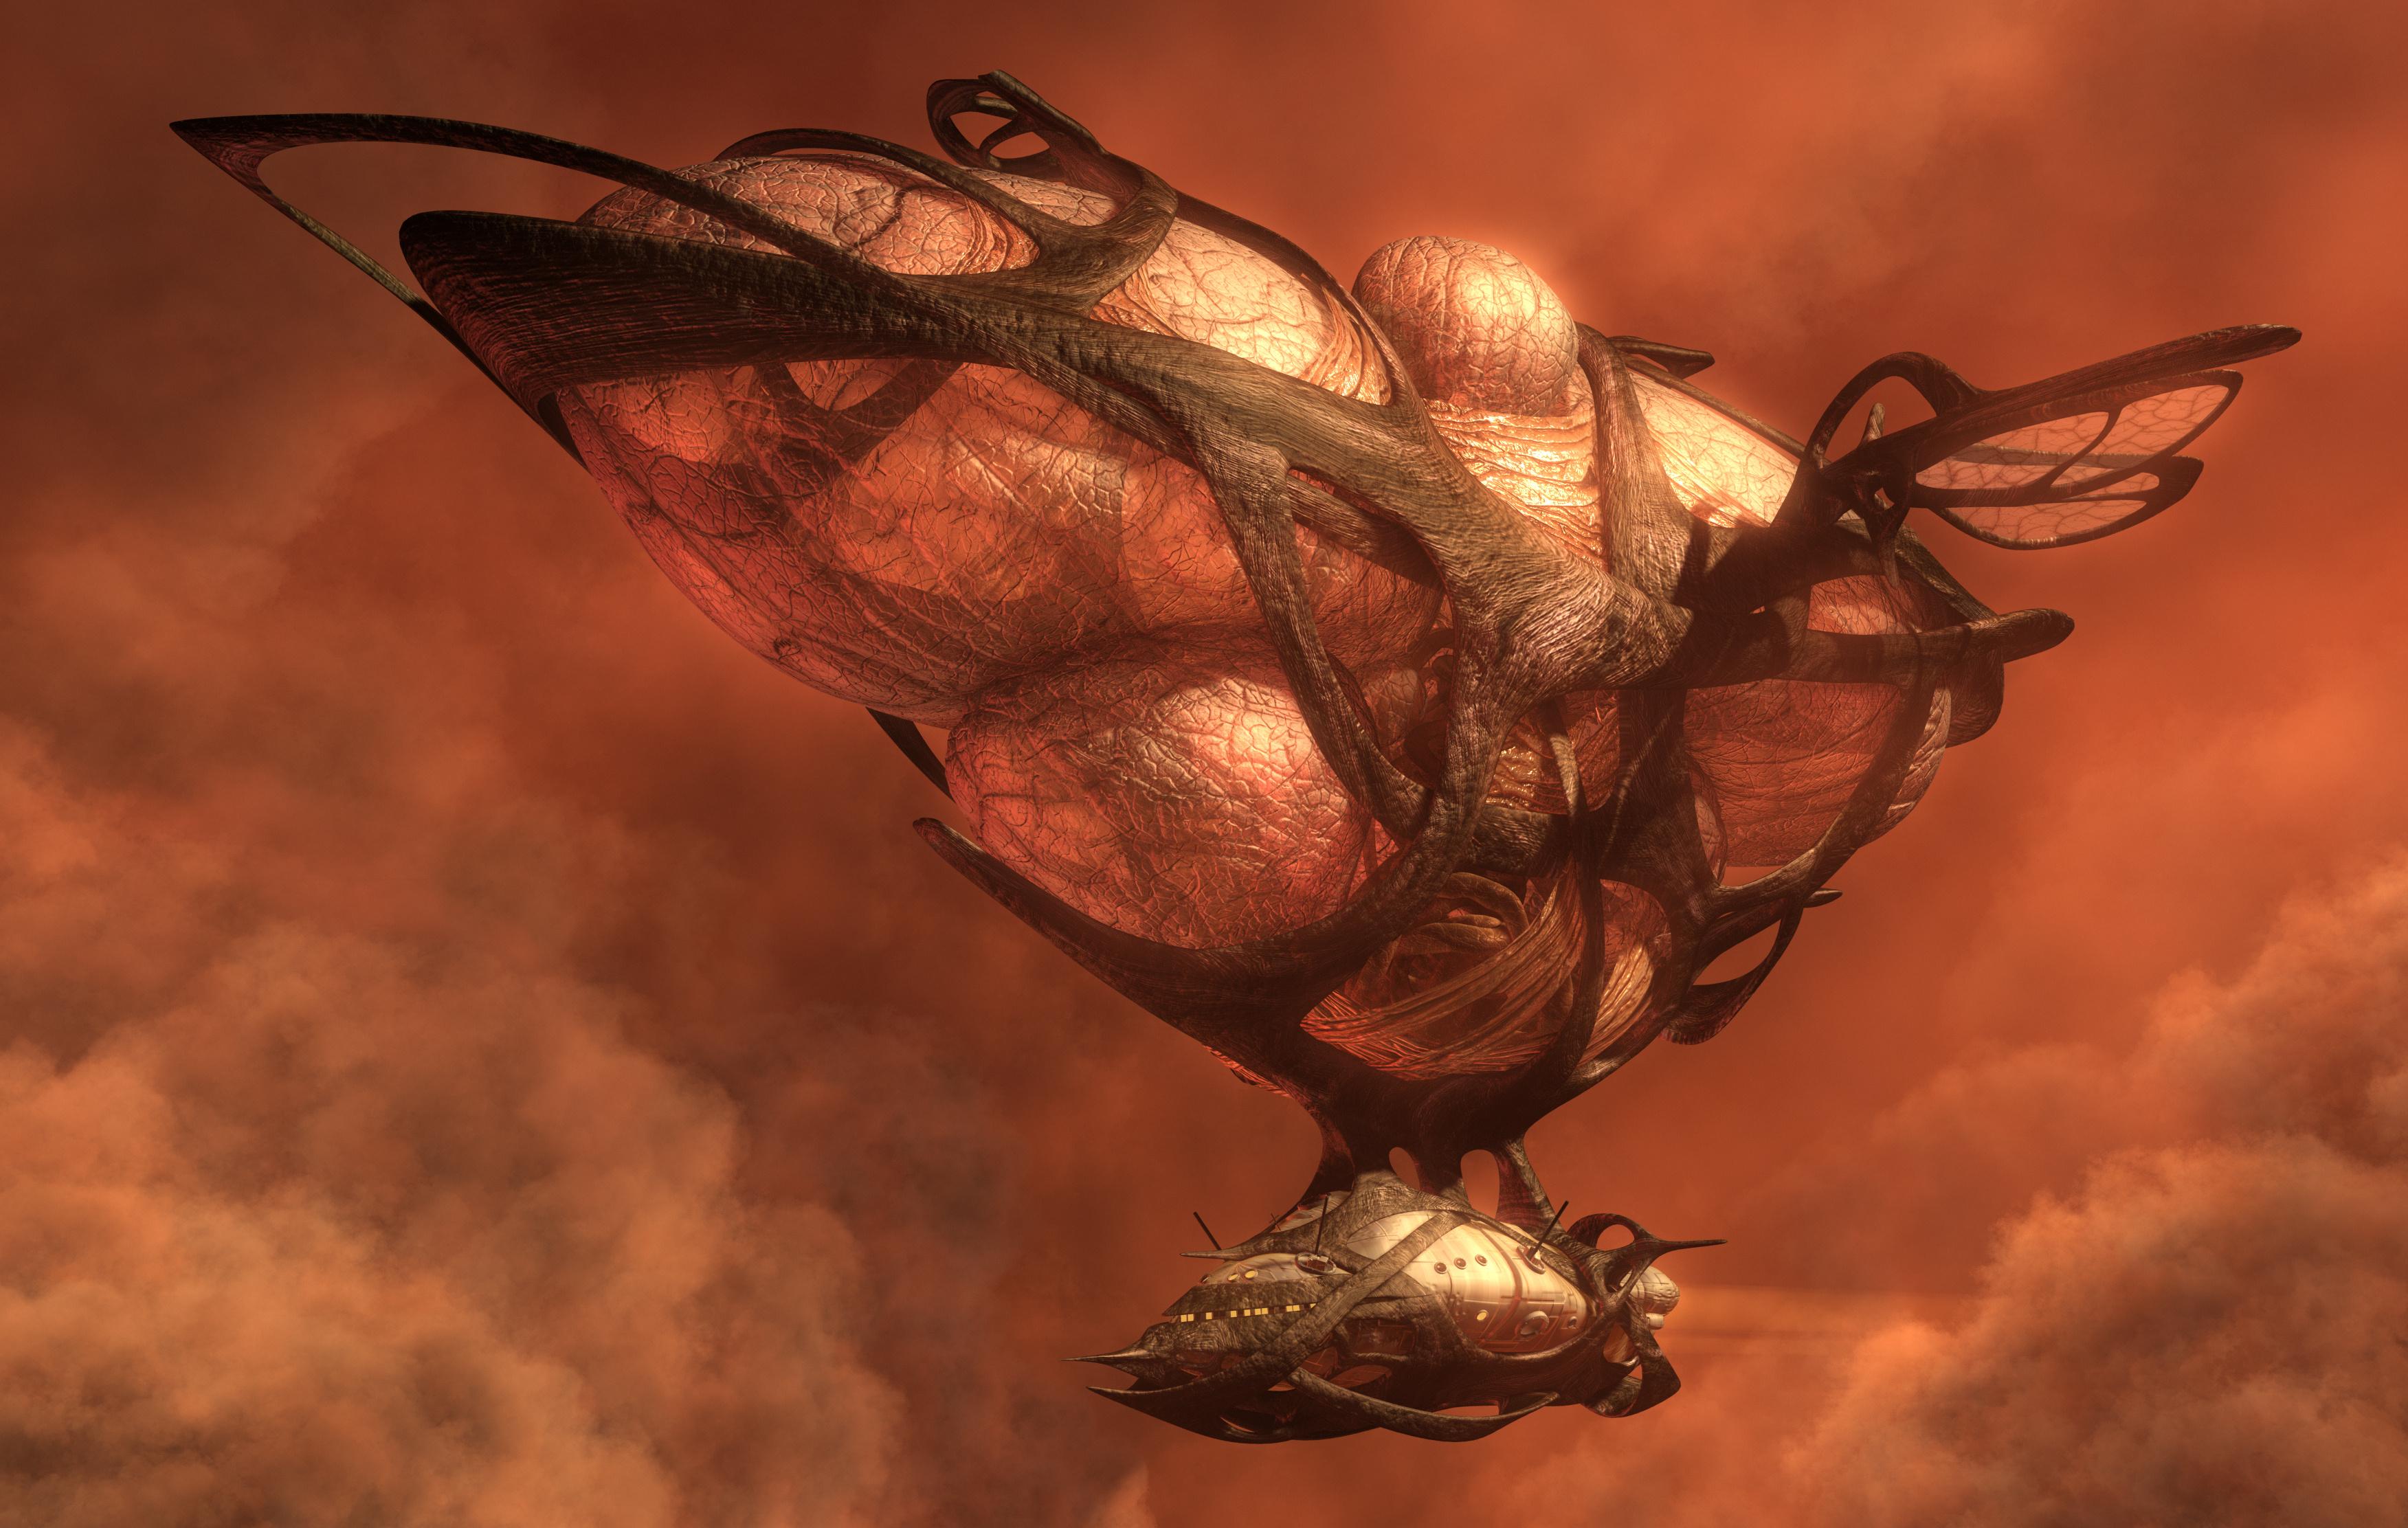 3D illustration of a flying organic fantasy airship